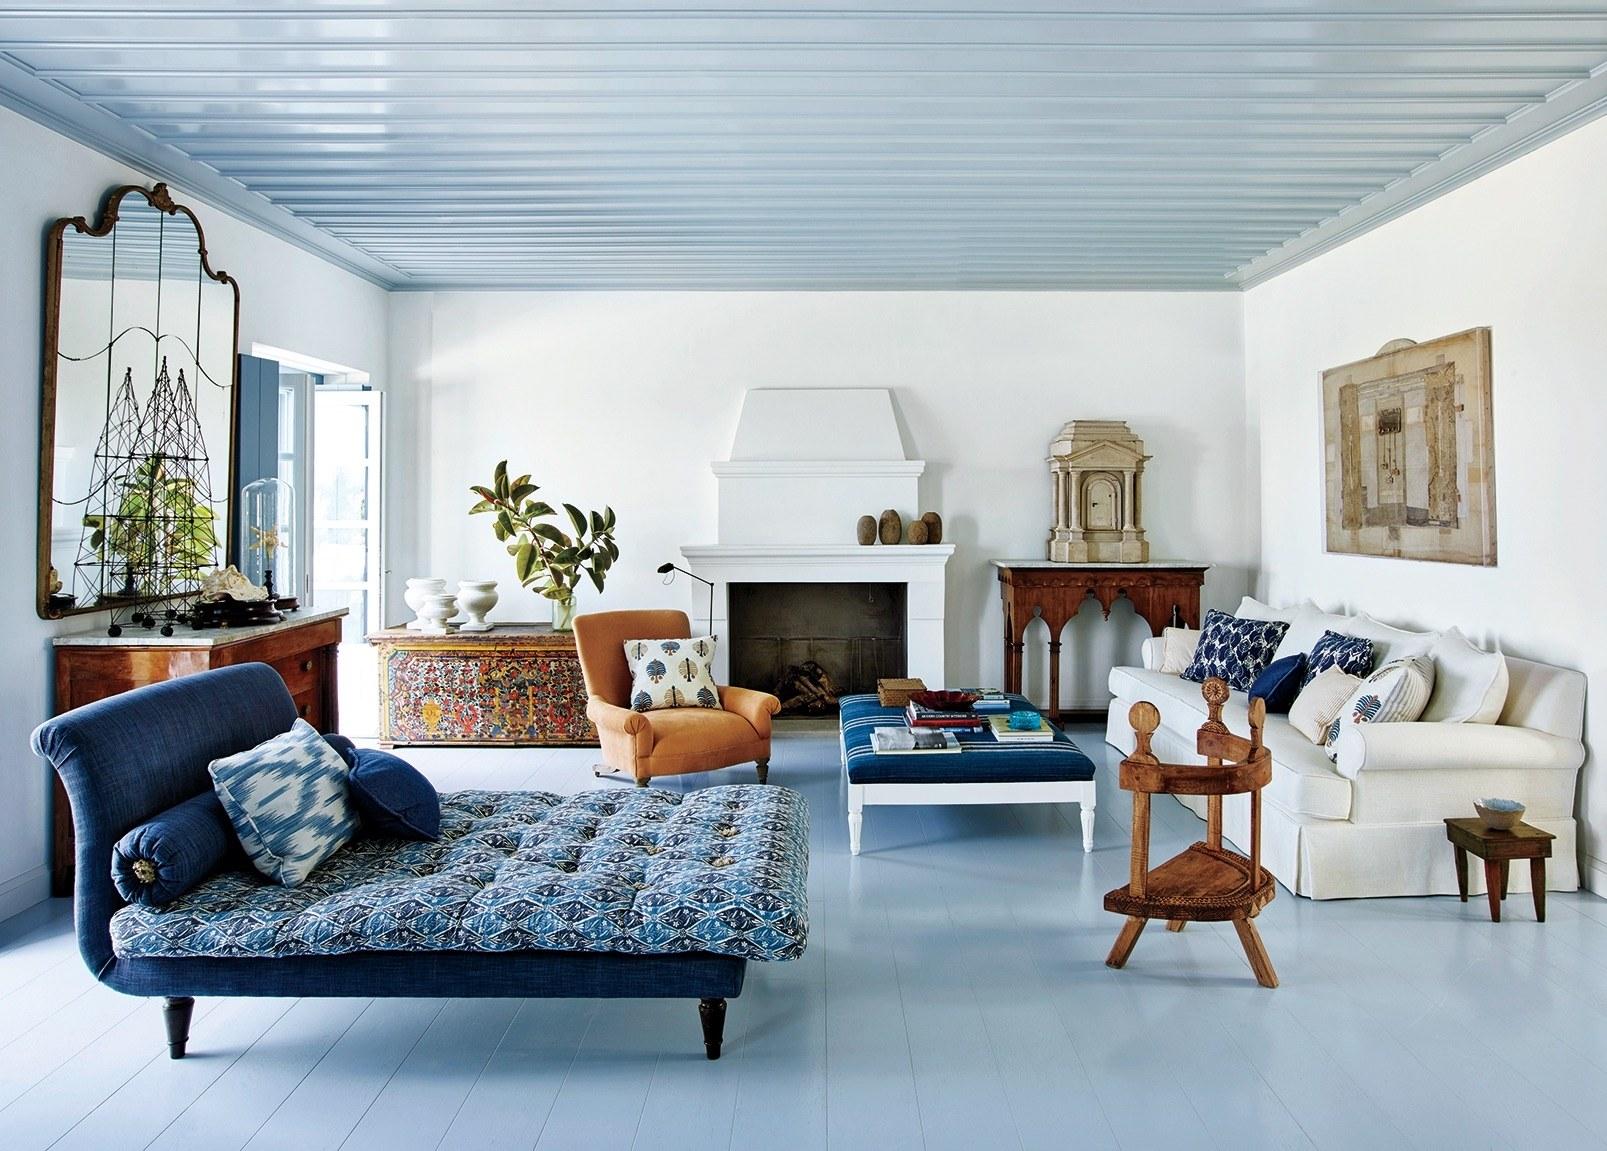 Bring Summer's Luxurious Warmth Home